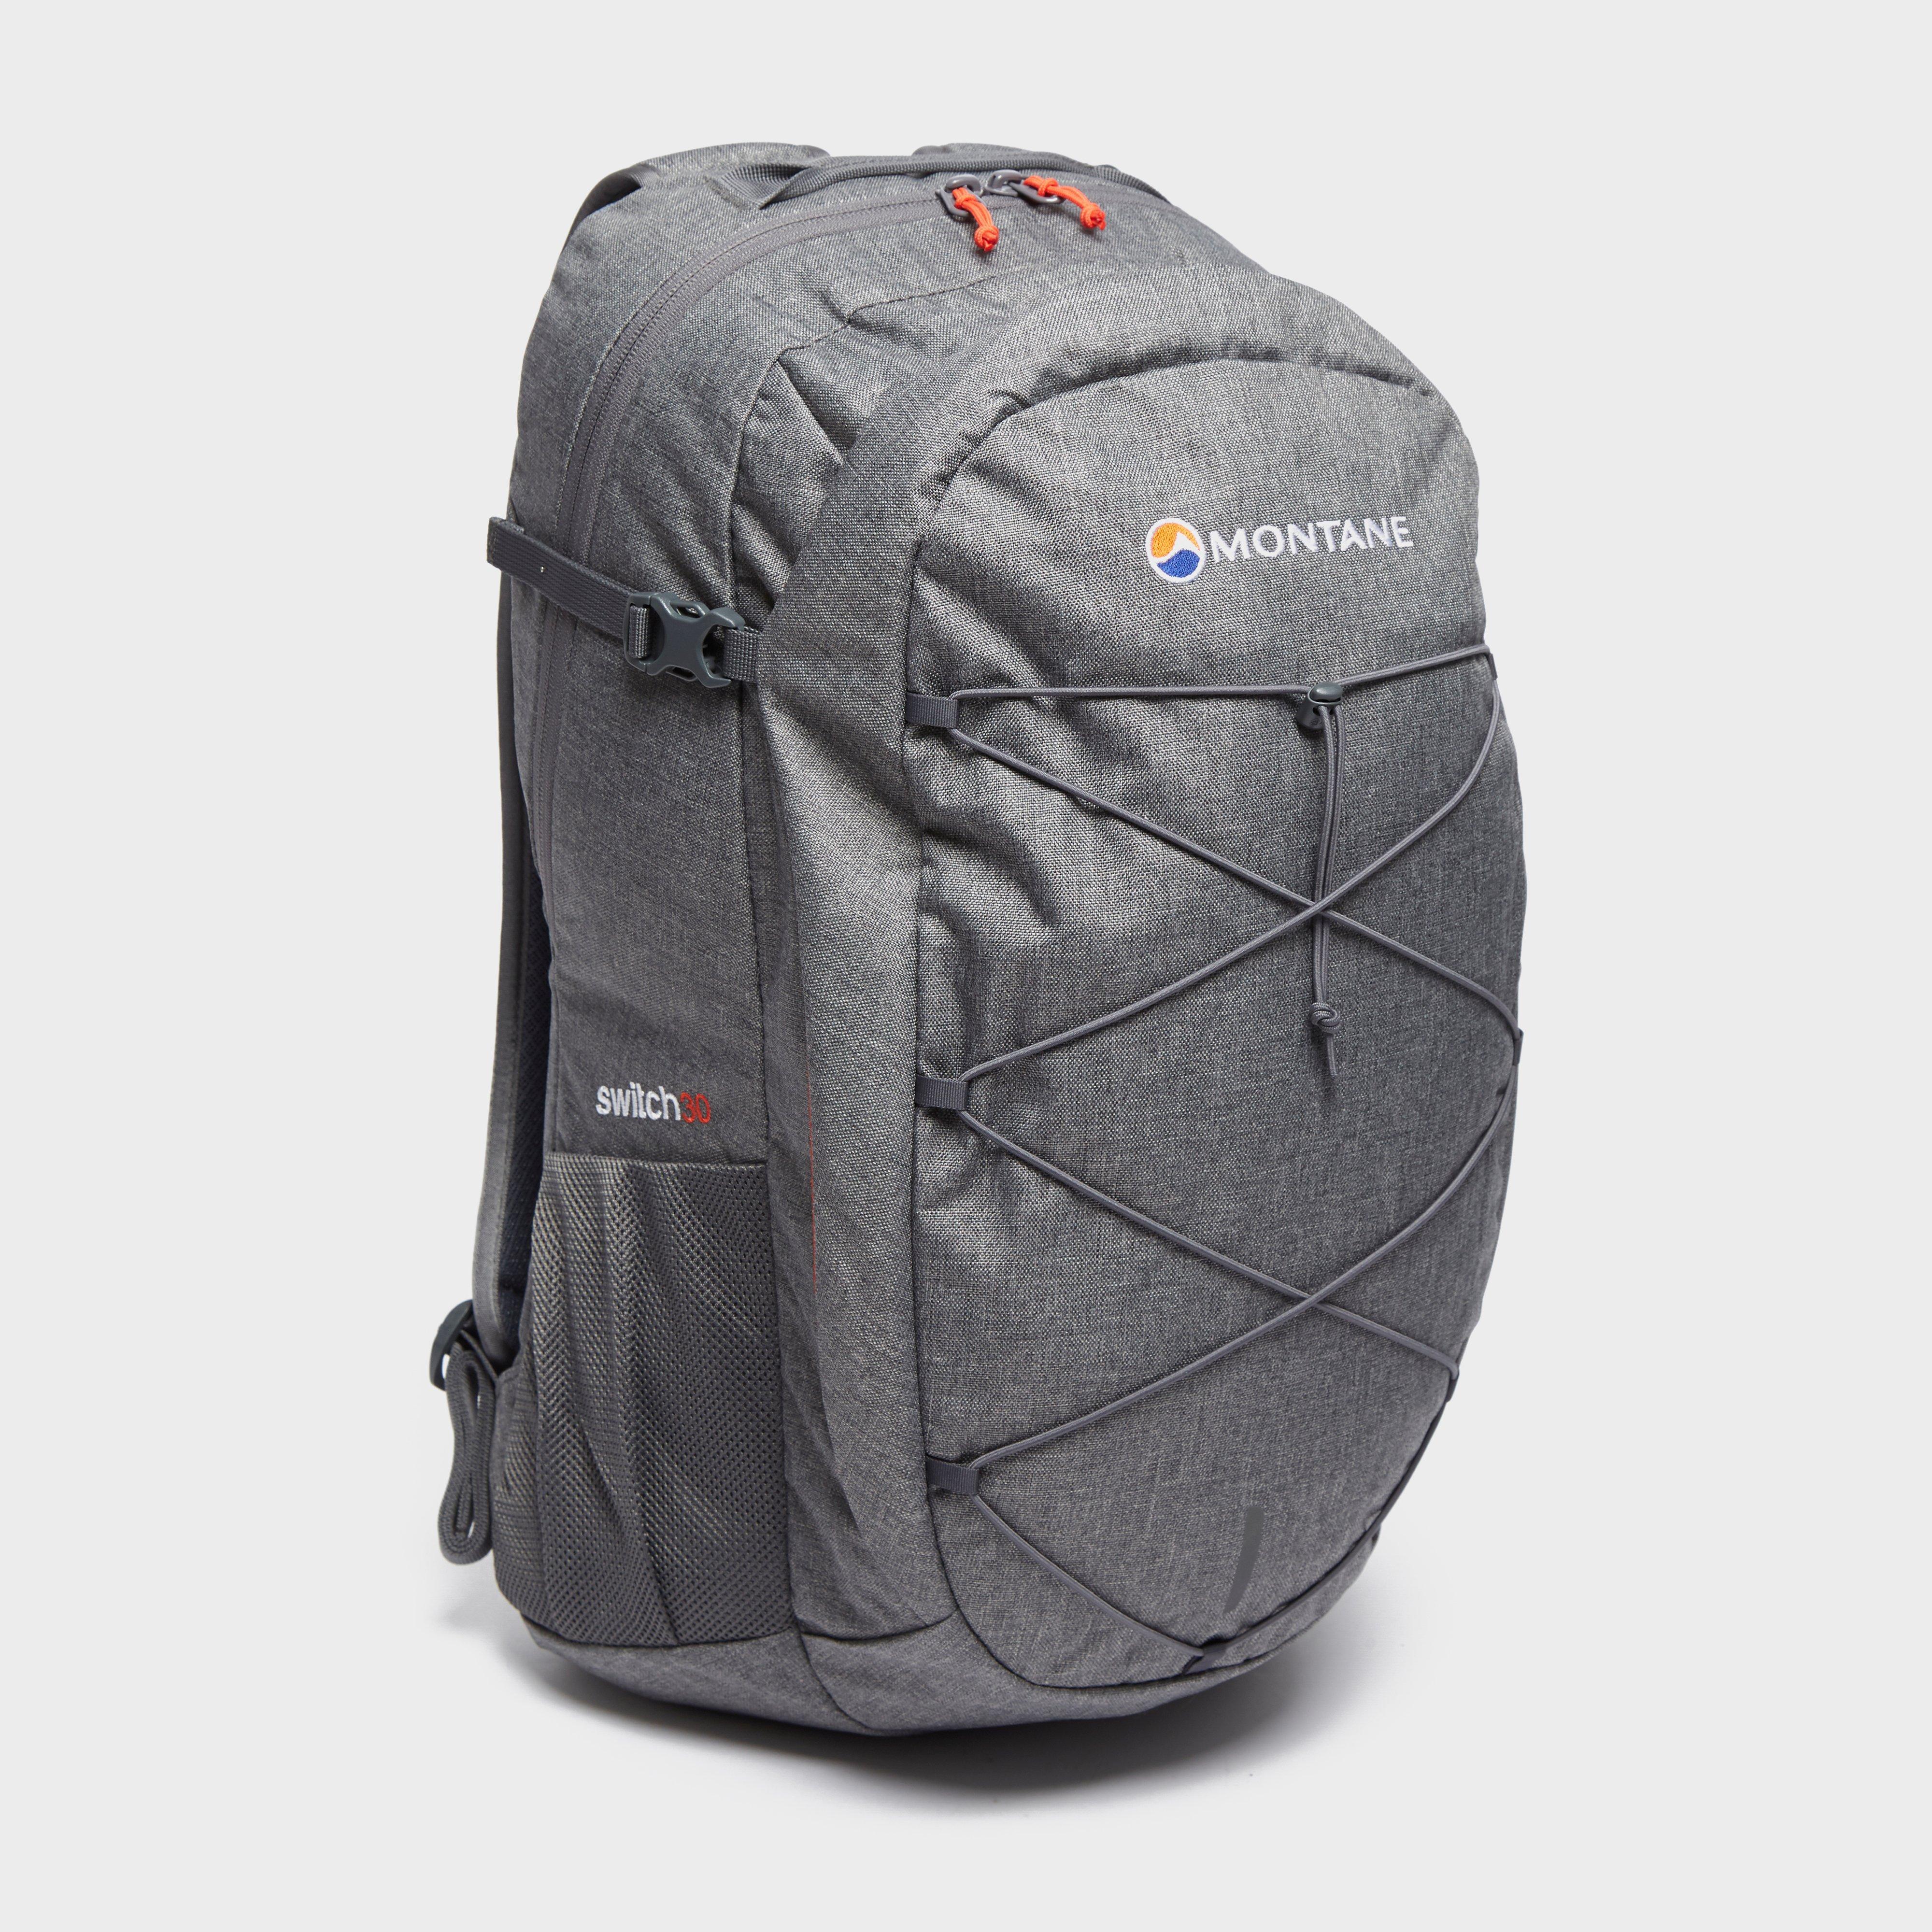 Montane Montane Switch 30 Daypack, Grey